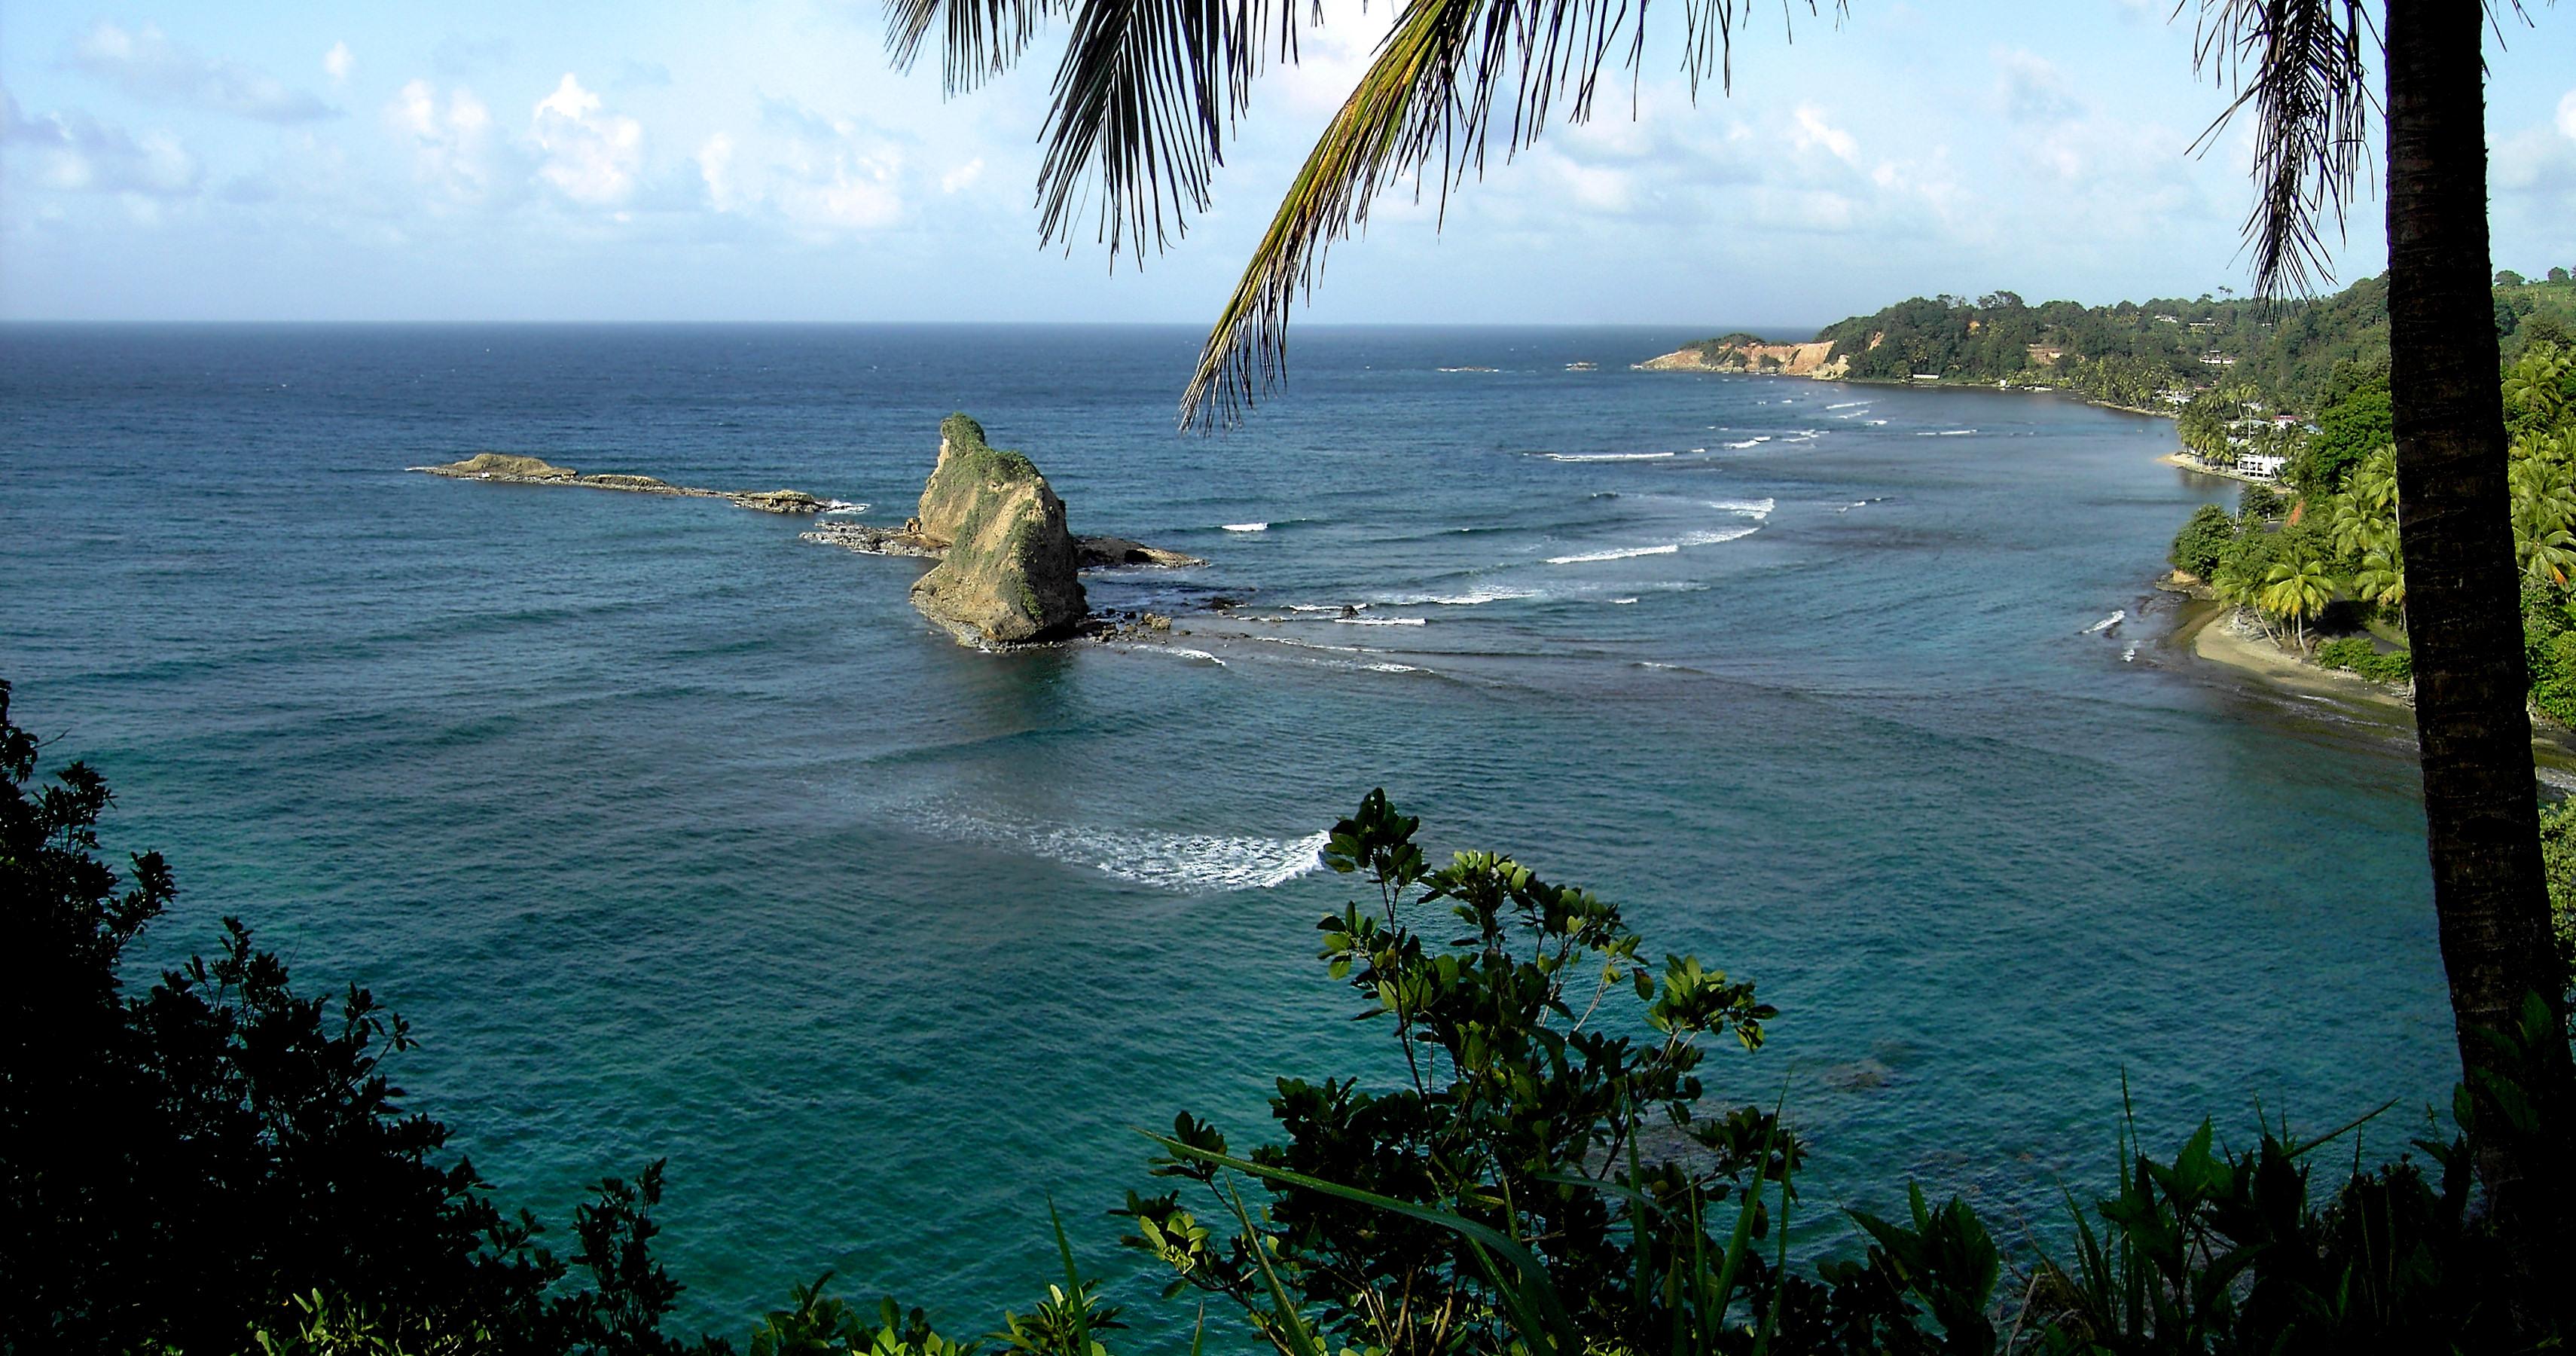 Photo Credit https://www.wikiwand.com/en/Saint_Andrew_Parish,_Dominica